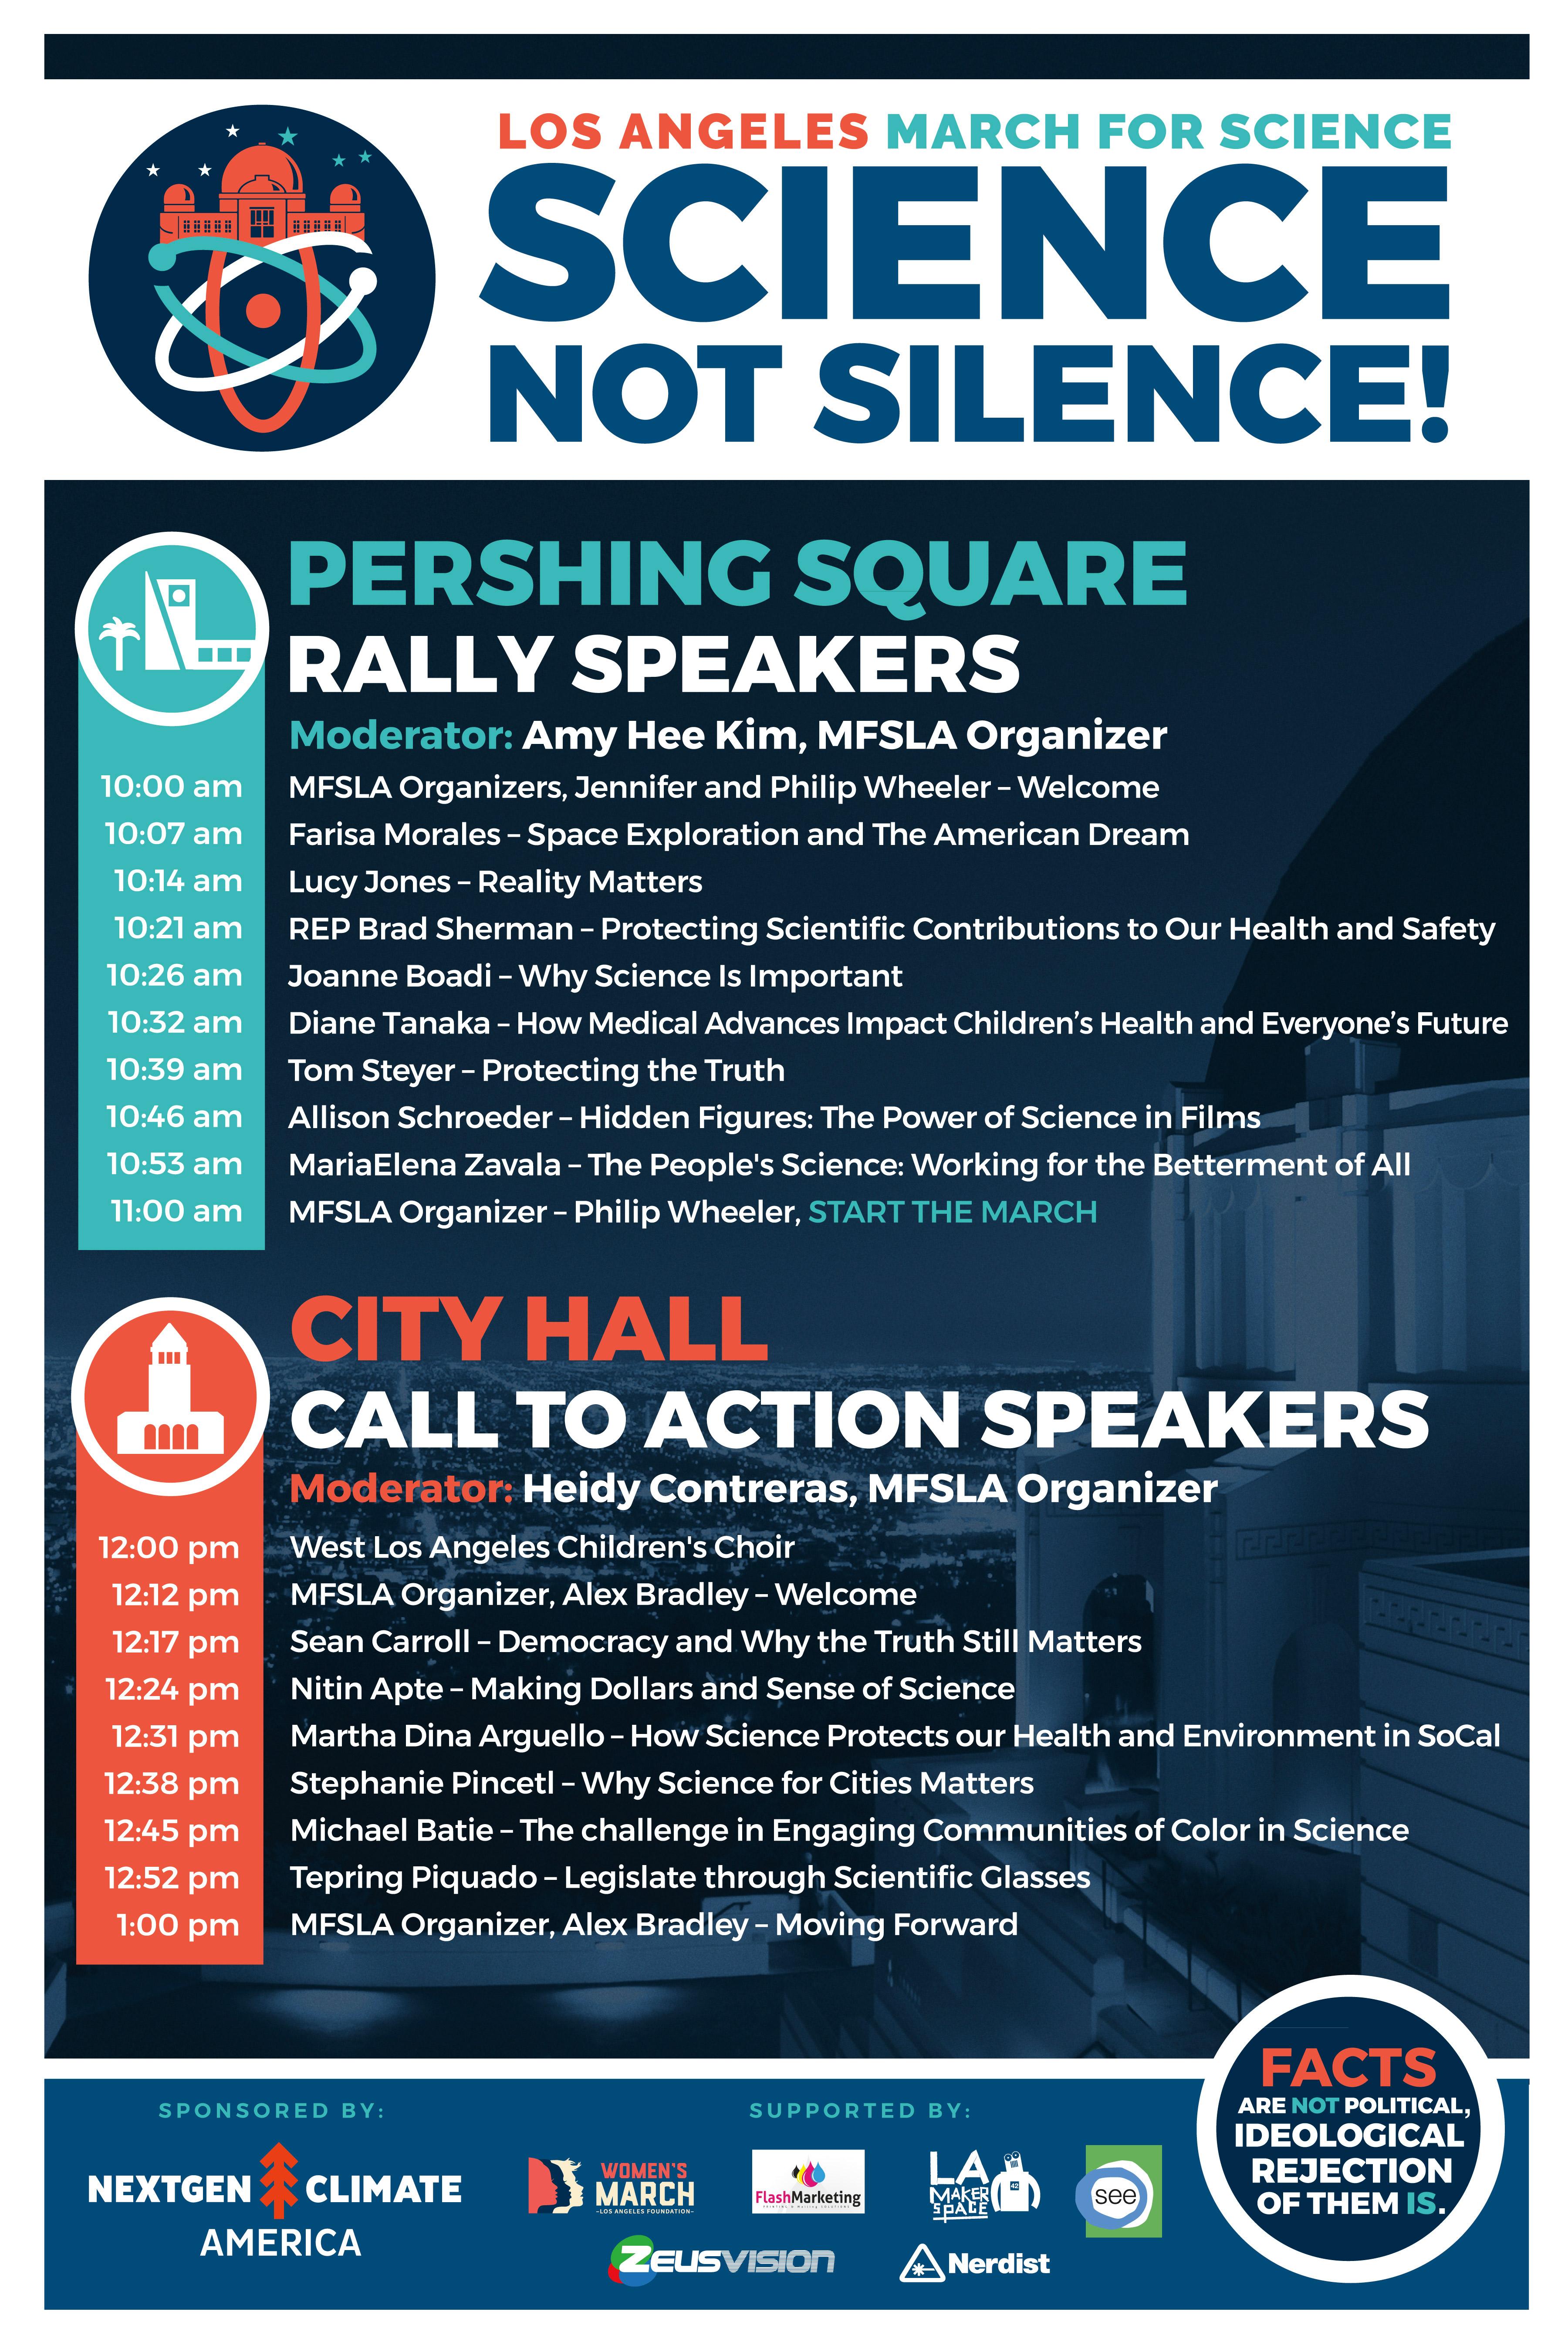 March for science la speakers download speakers program xflitez Choice Image